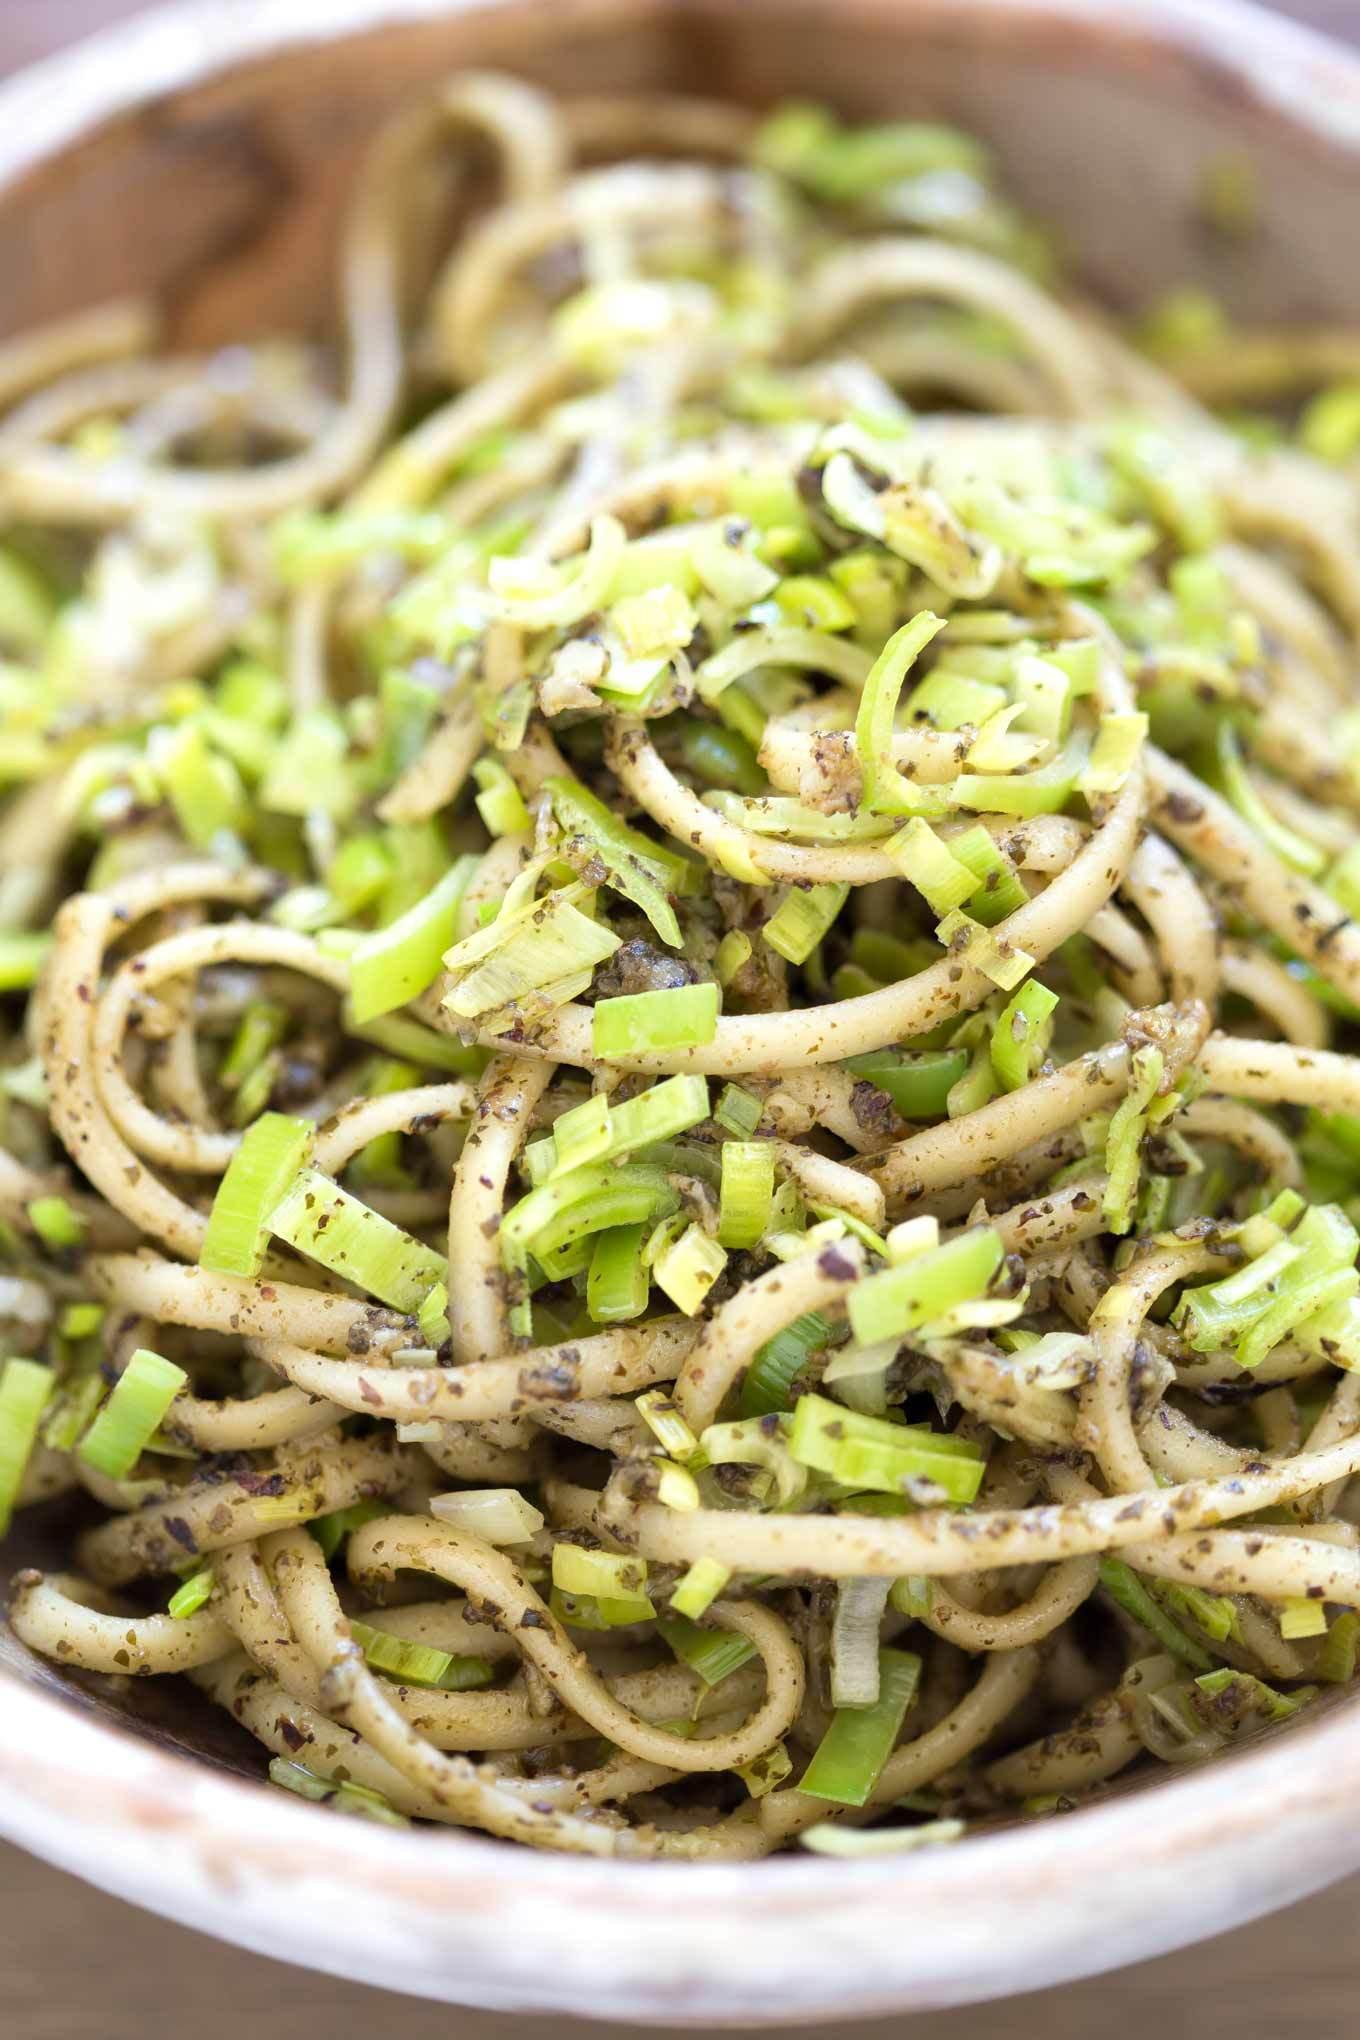 Vegan Leek Recipes  LEEK AND PESTO FETTUCCINE